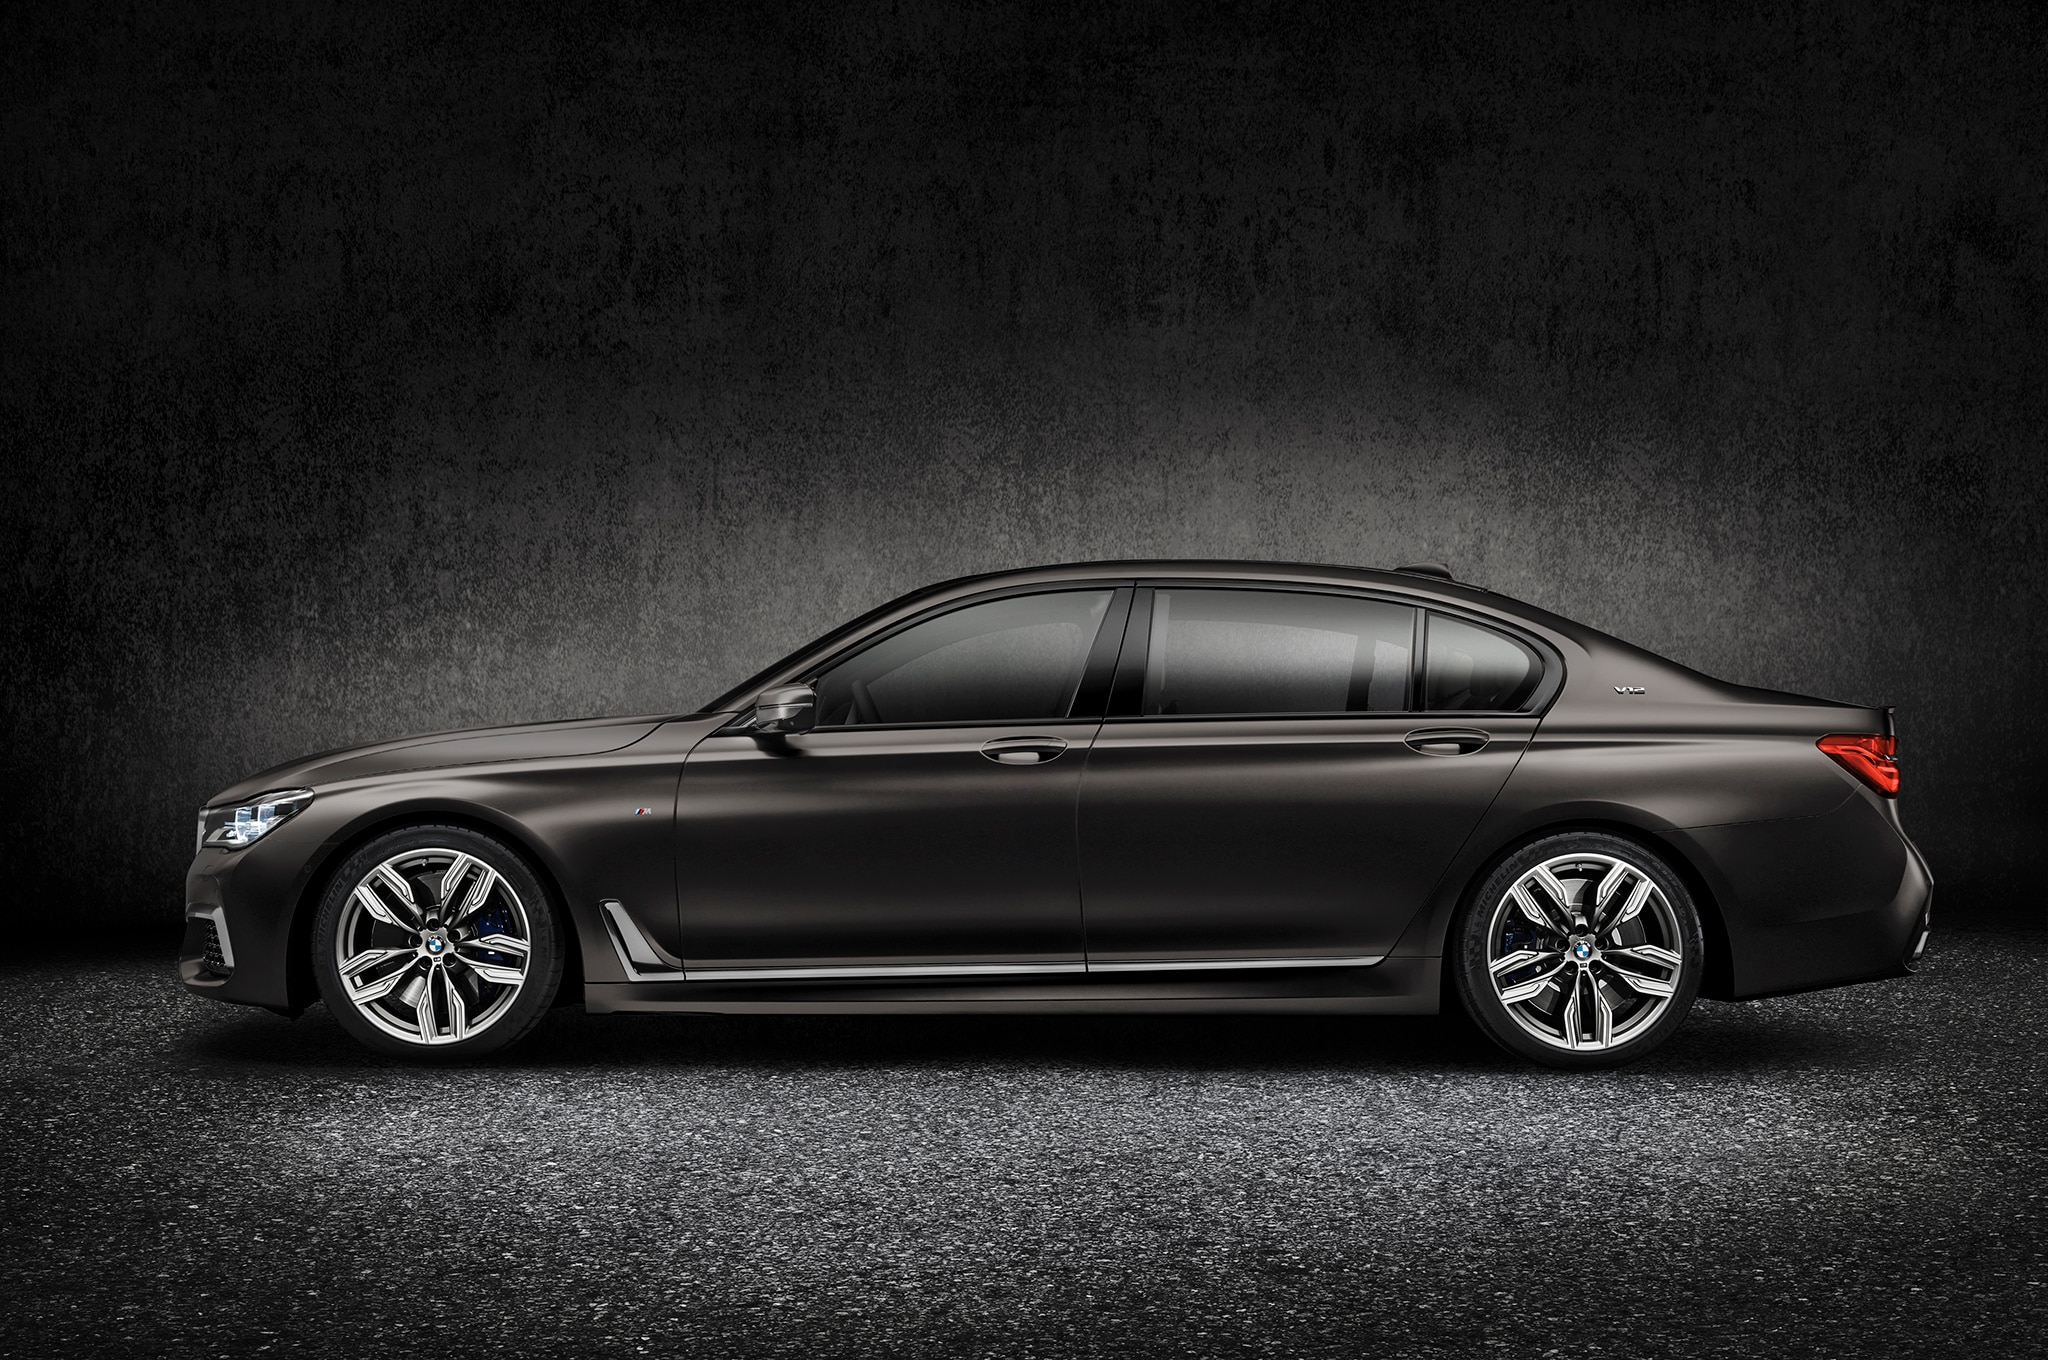 2017 bmw m760i xdrive is a 12 cylinder high performance luxury sedan. Black Bedroom Furniture Sets. Home Design Ideas